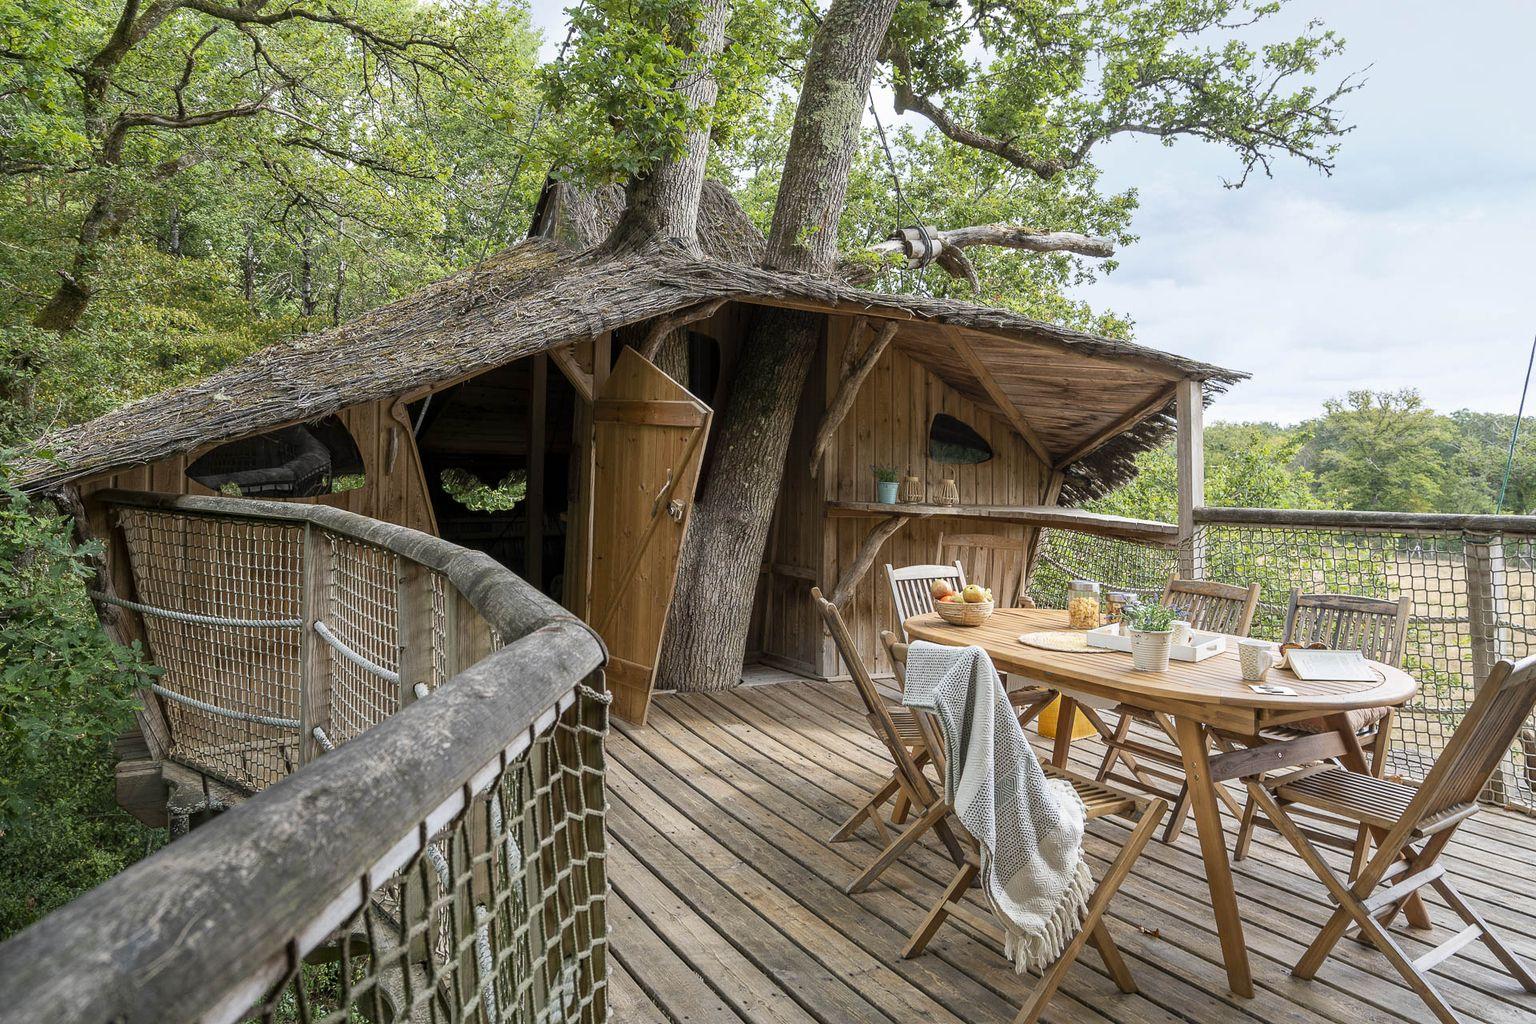 Location - Cabane Dans Les Arbres Forest Camp Insolite - Camping Sandaya Les Alicourts